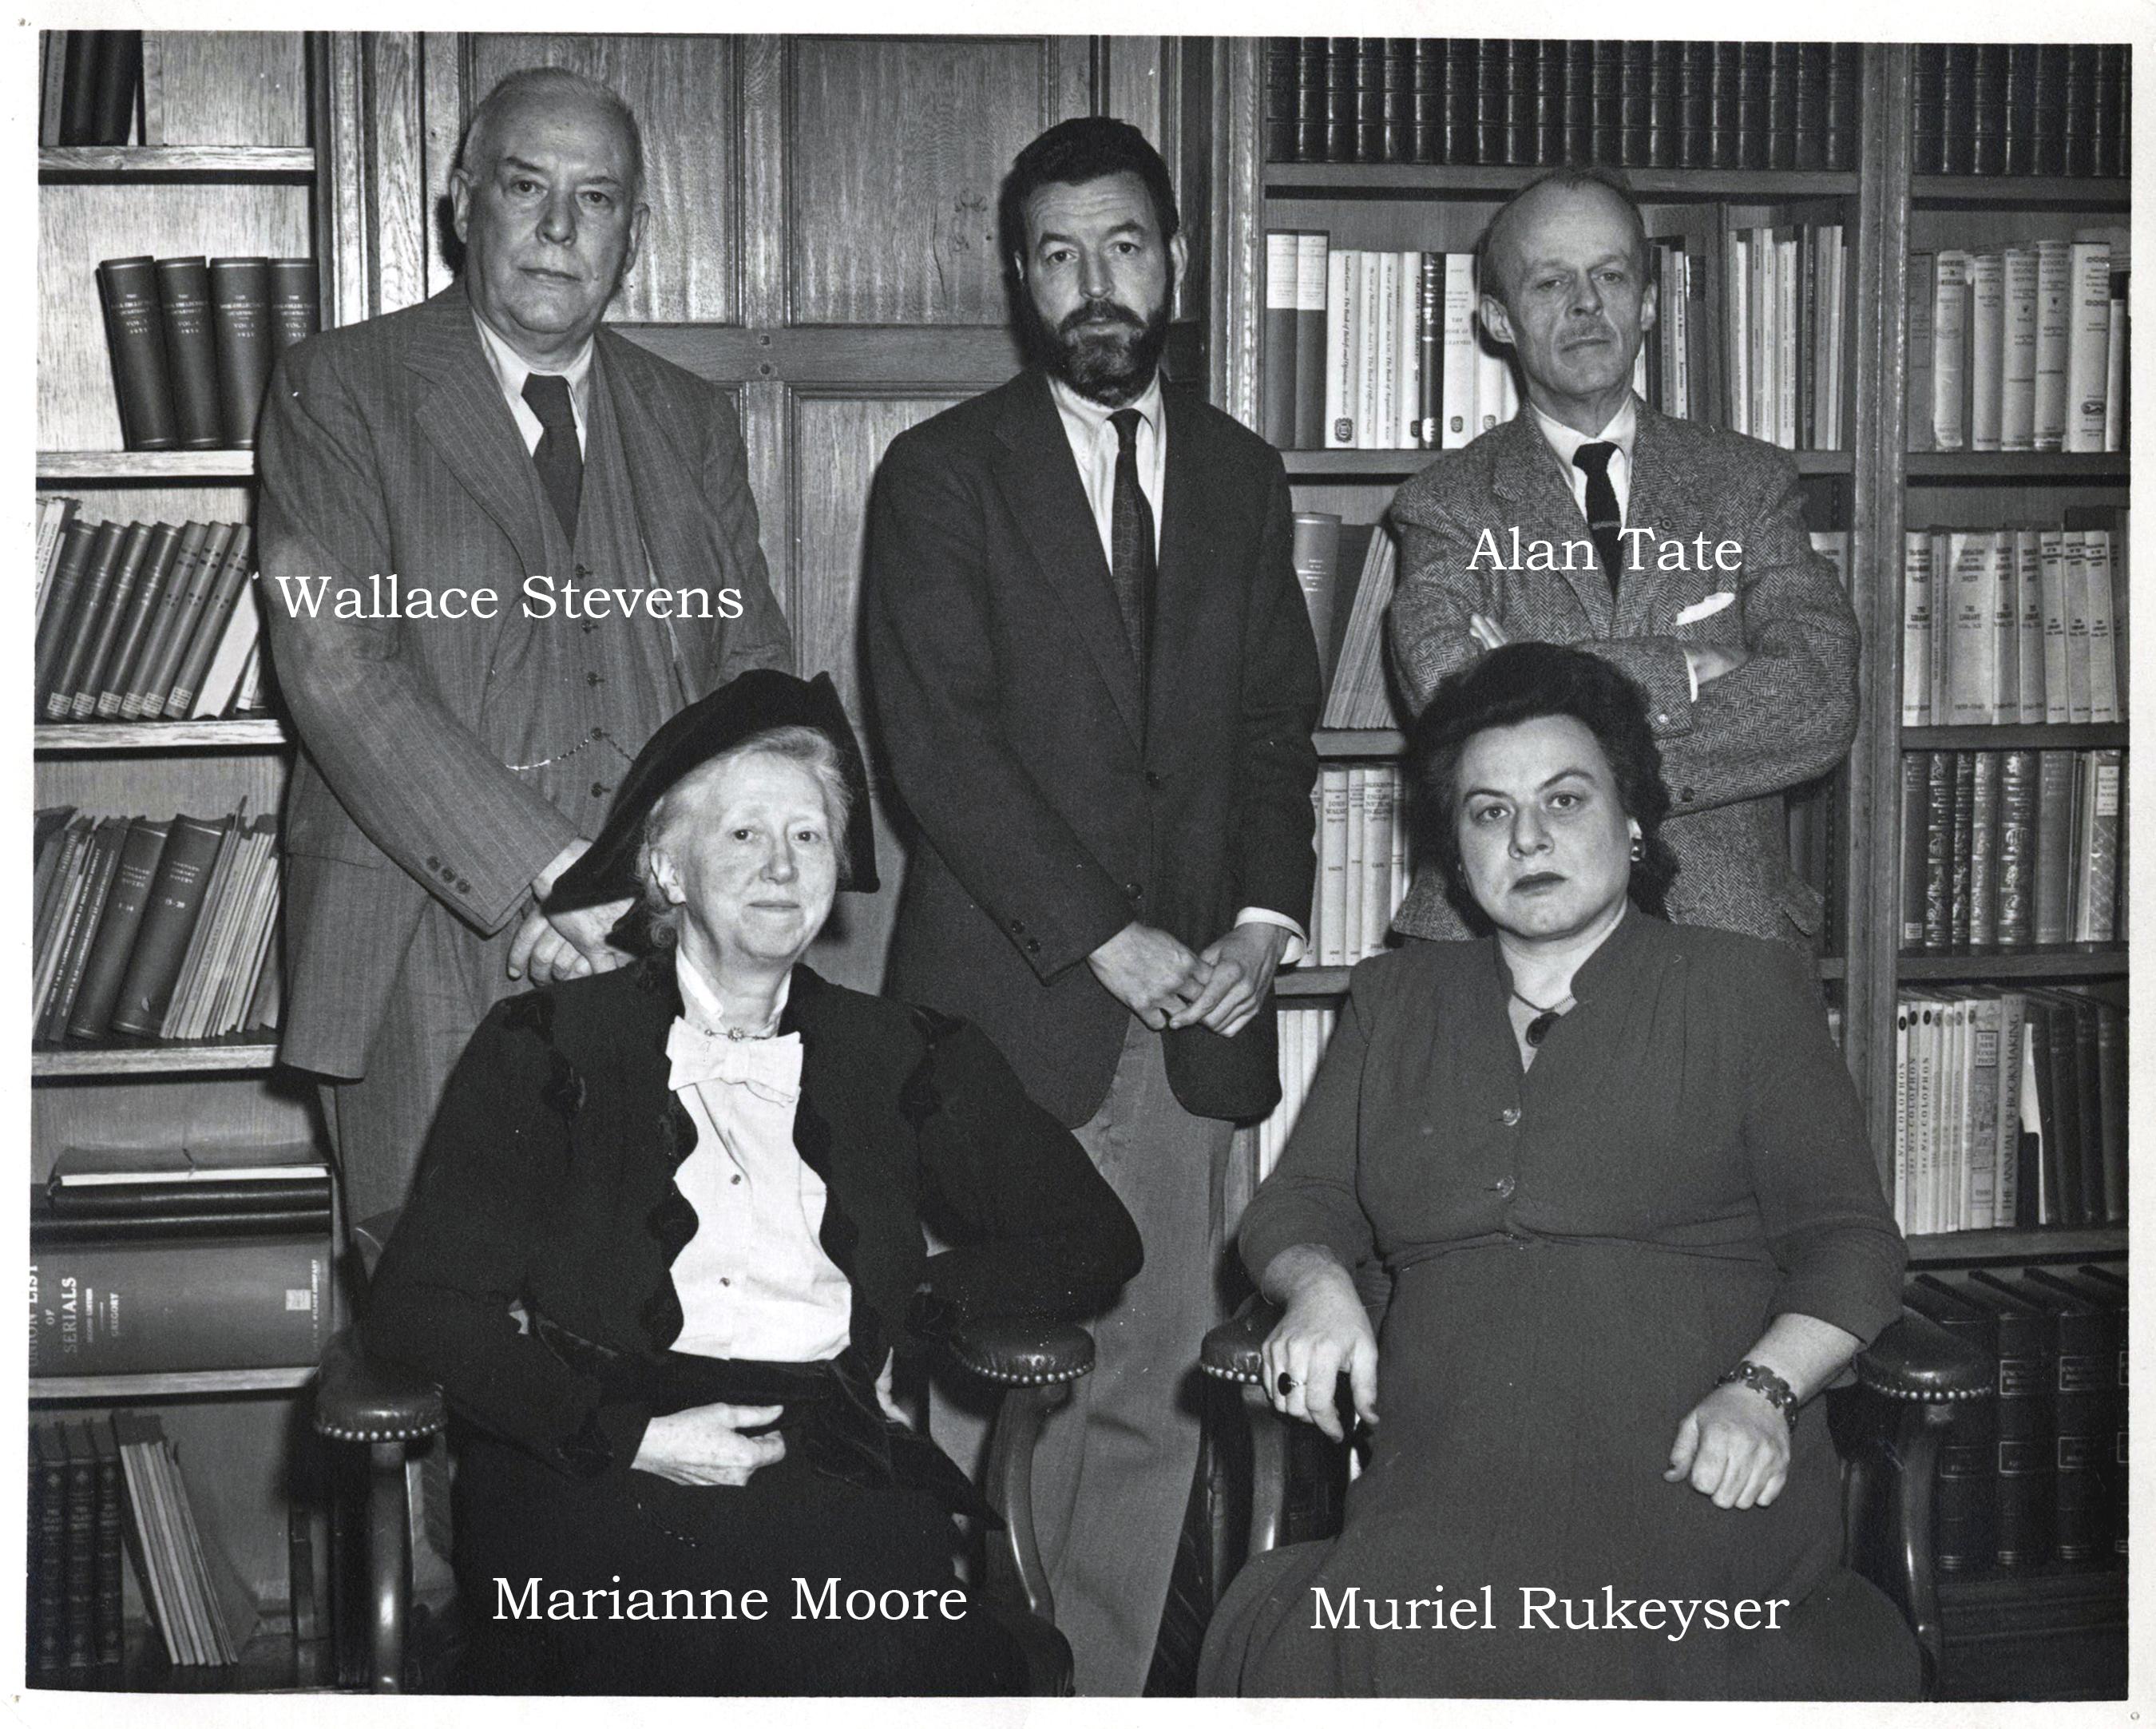 Muriel Rukeyser with fellow poets Randall Jarrell, Wallace Stevens, Alan  Tate, Marianne Moore in 1955 | Jewish Women's Archive